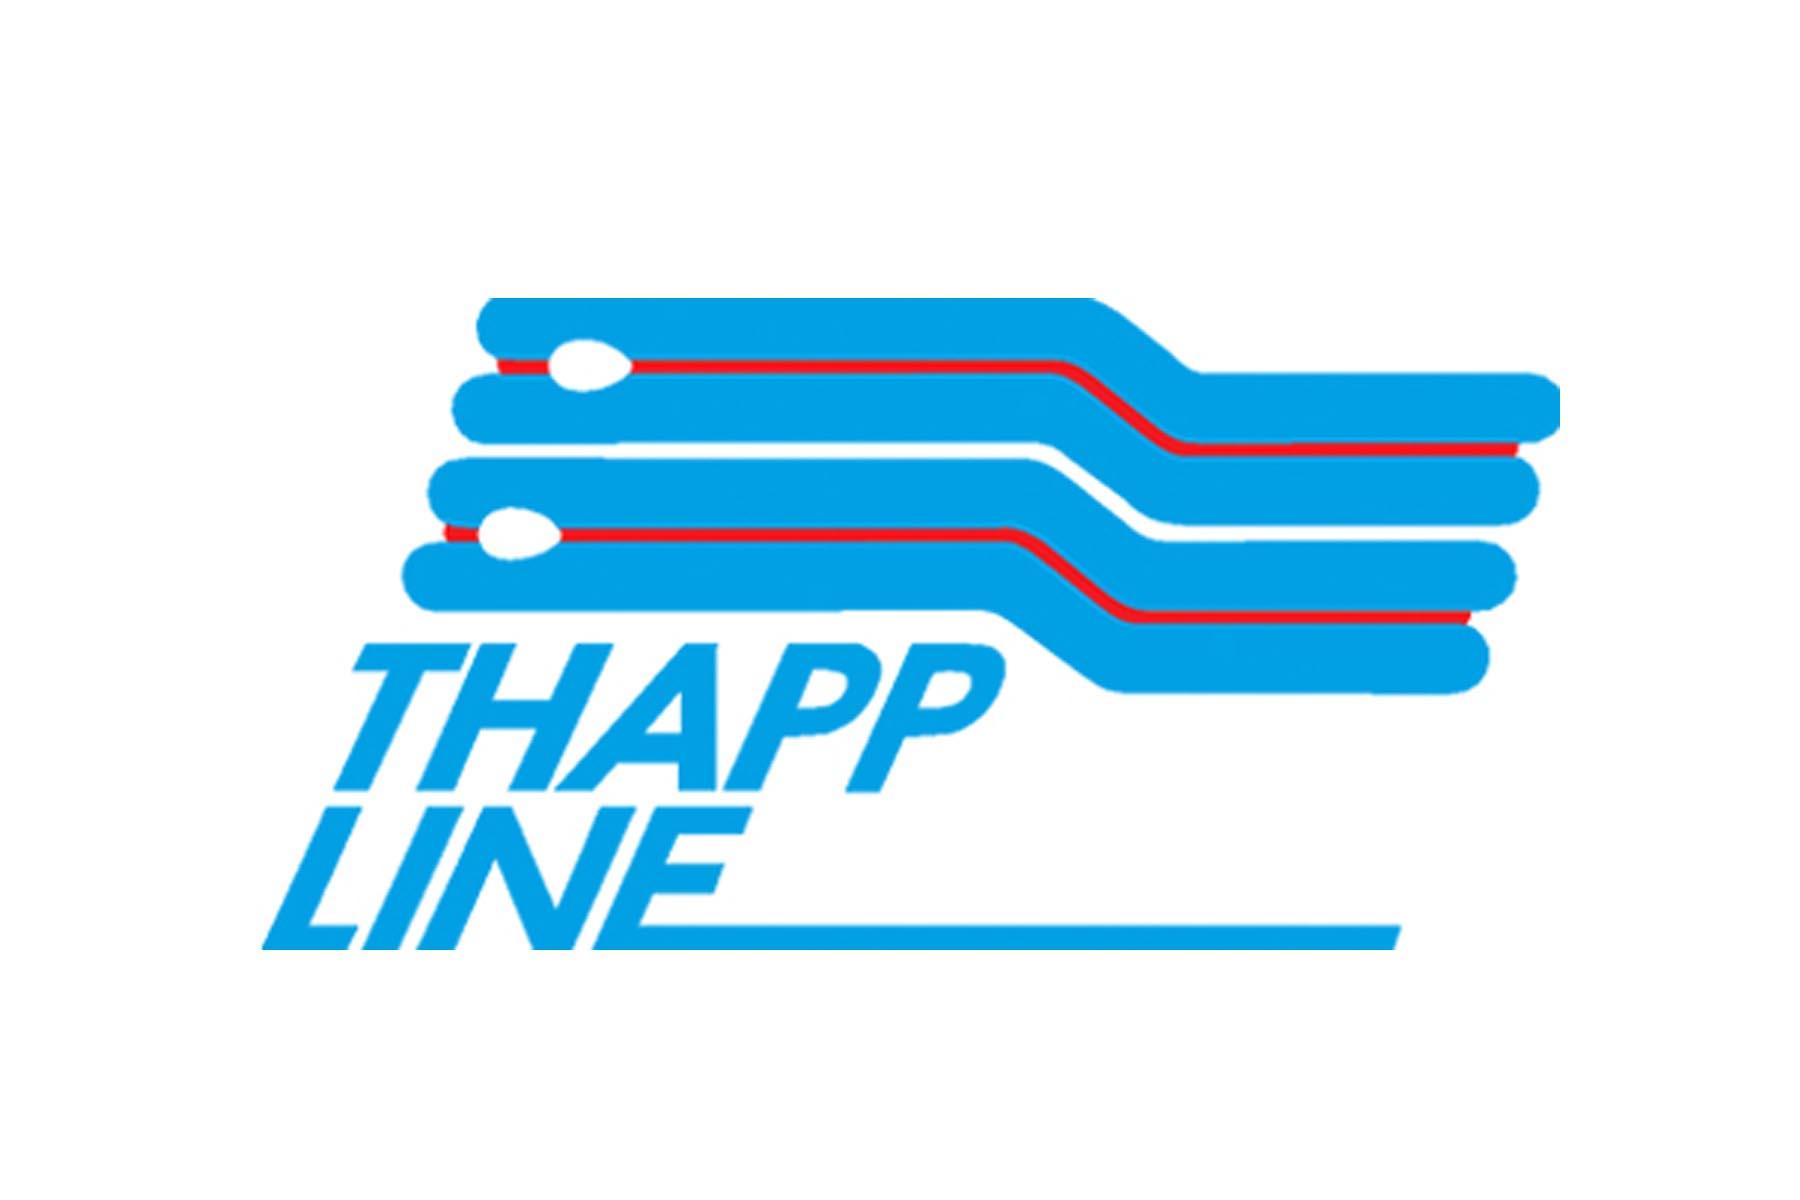 ThappLine